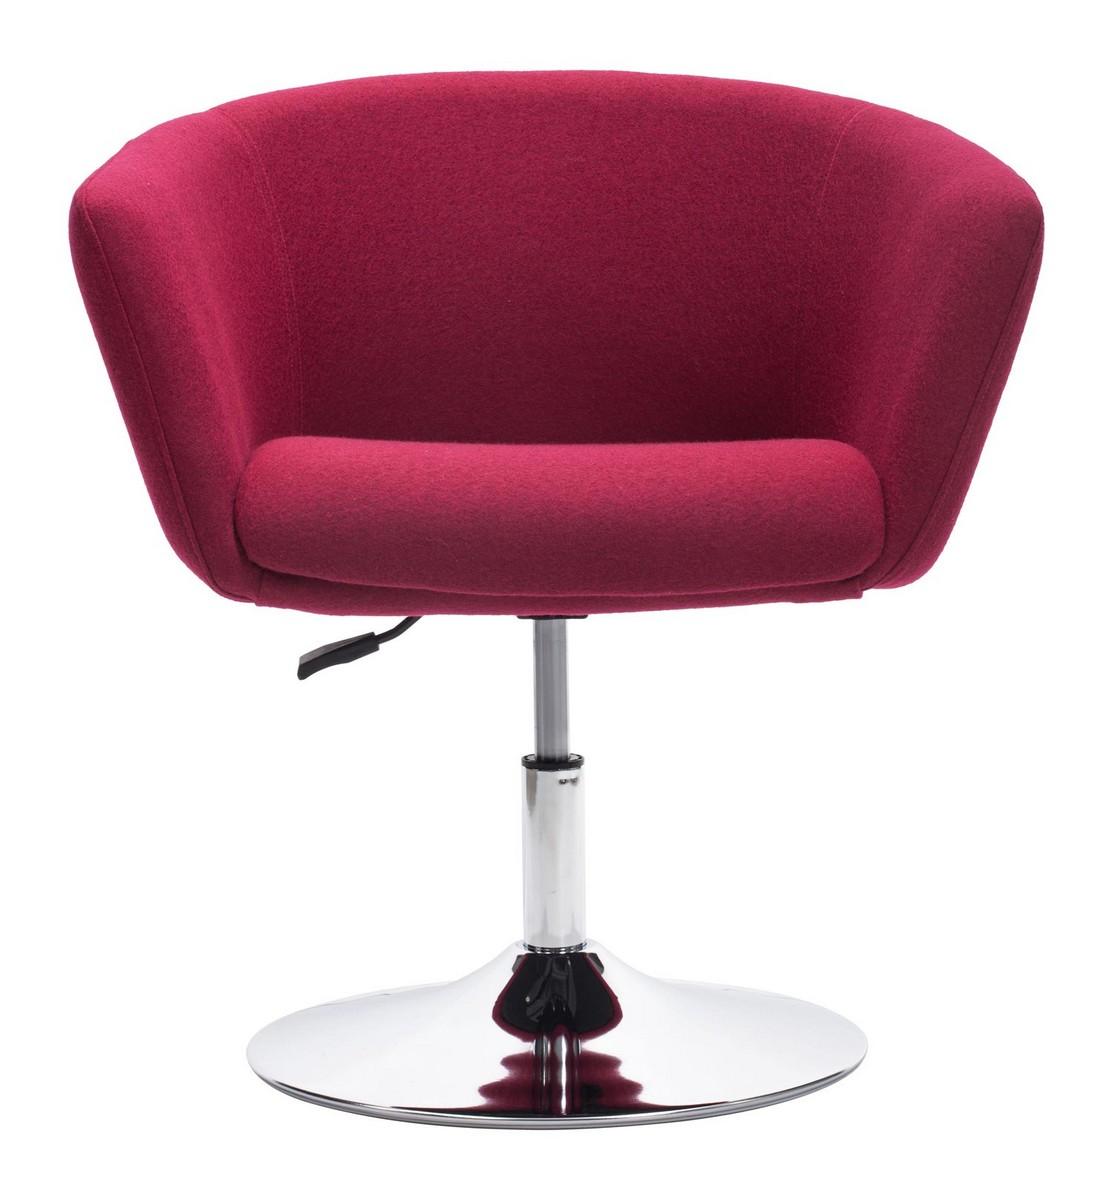 Zuo Modern Umea Occasional Chair - Carnelian Red